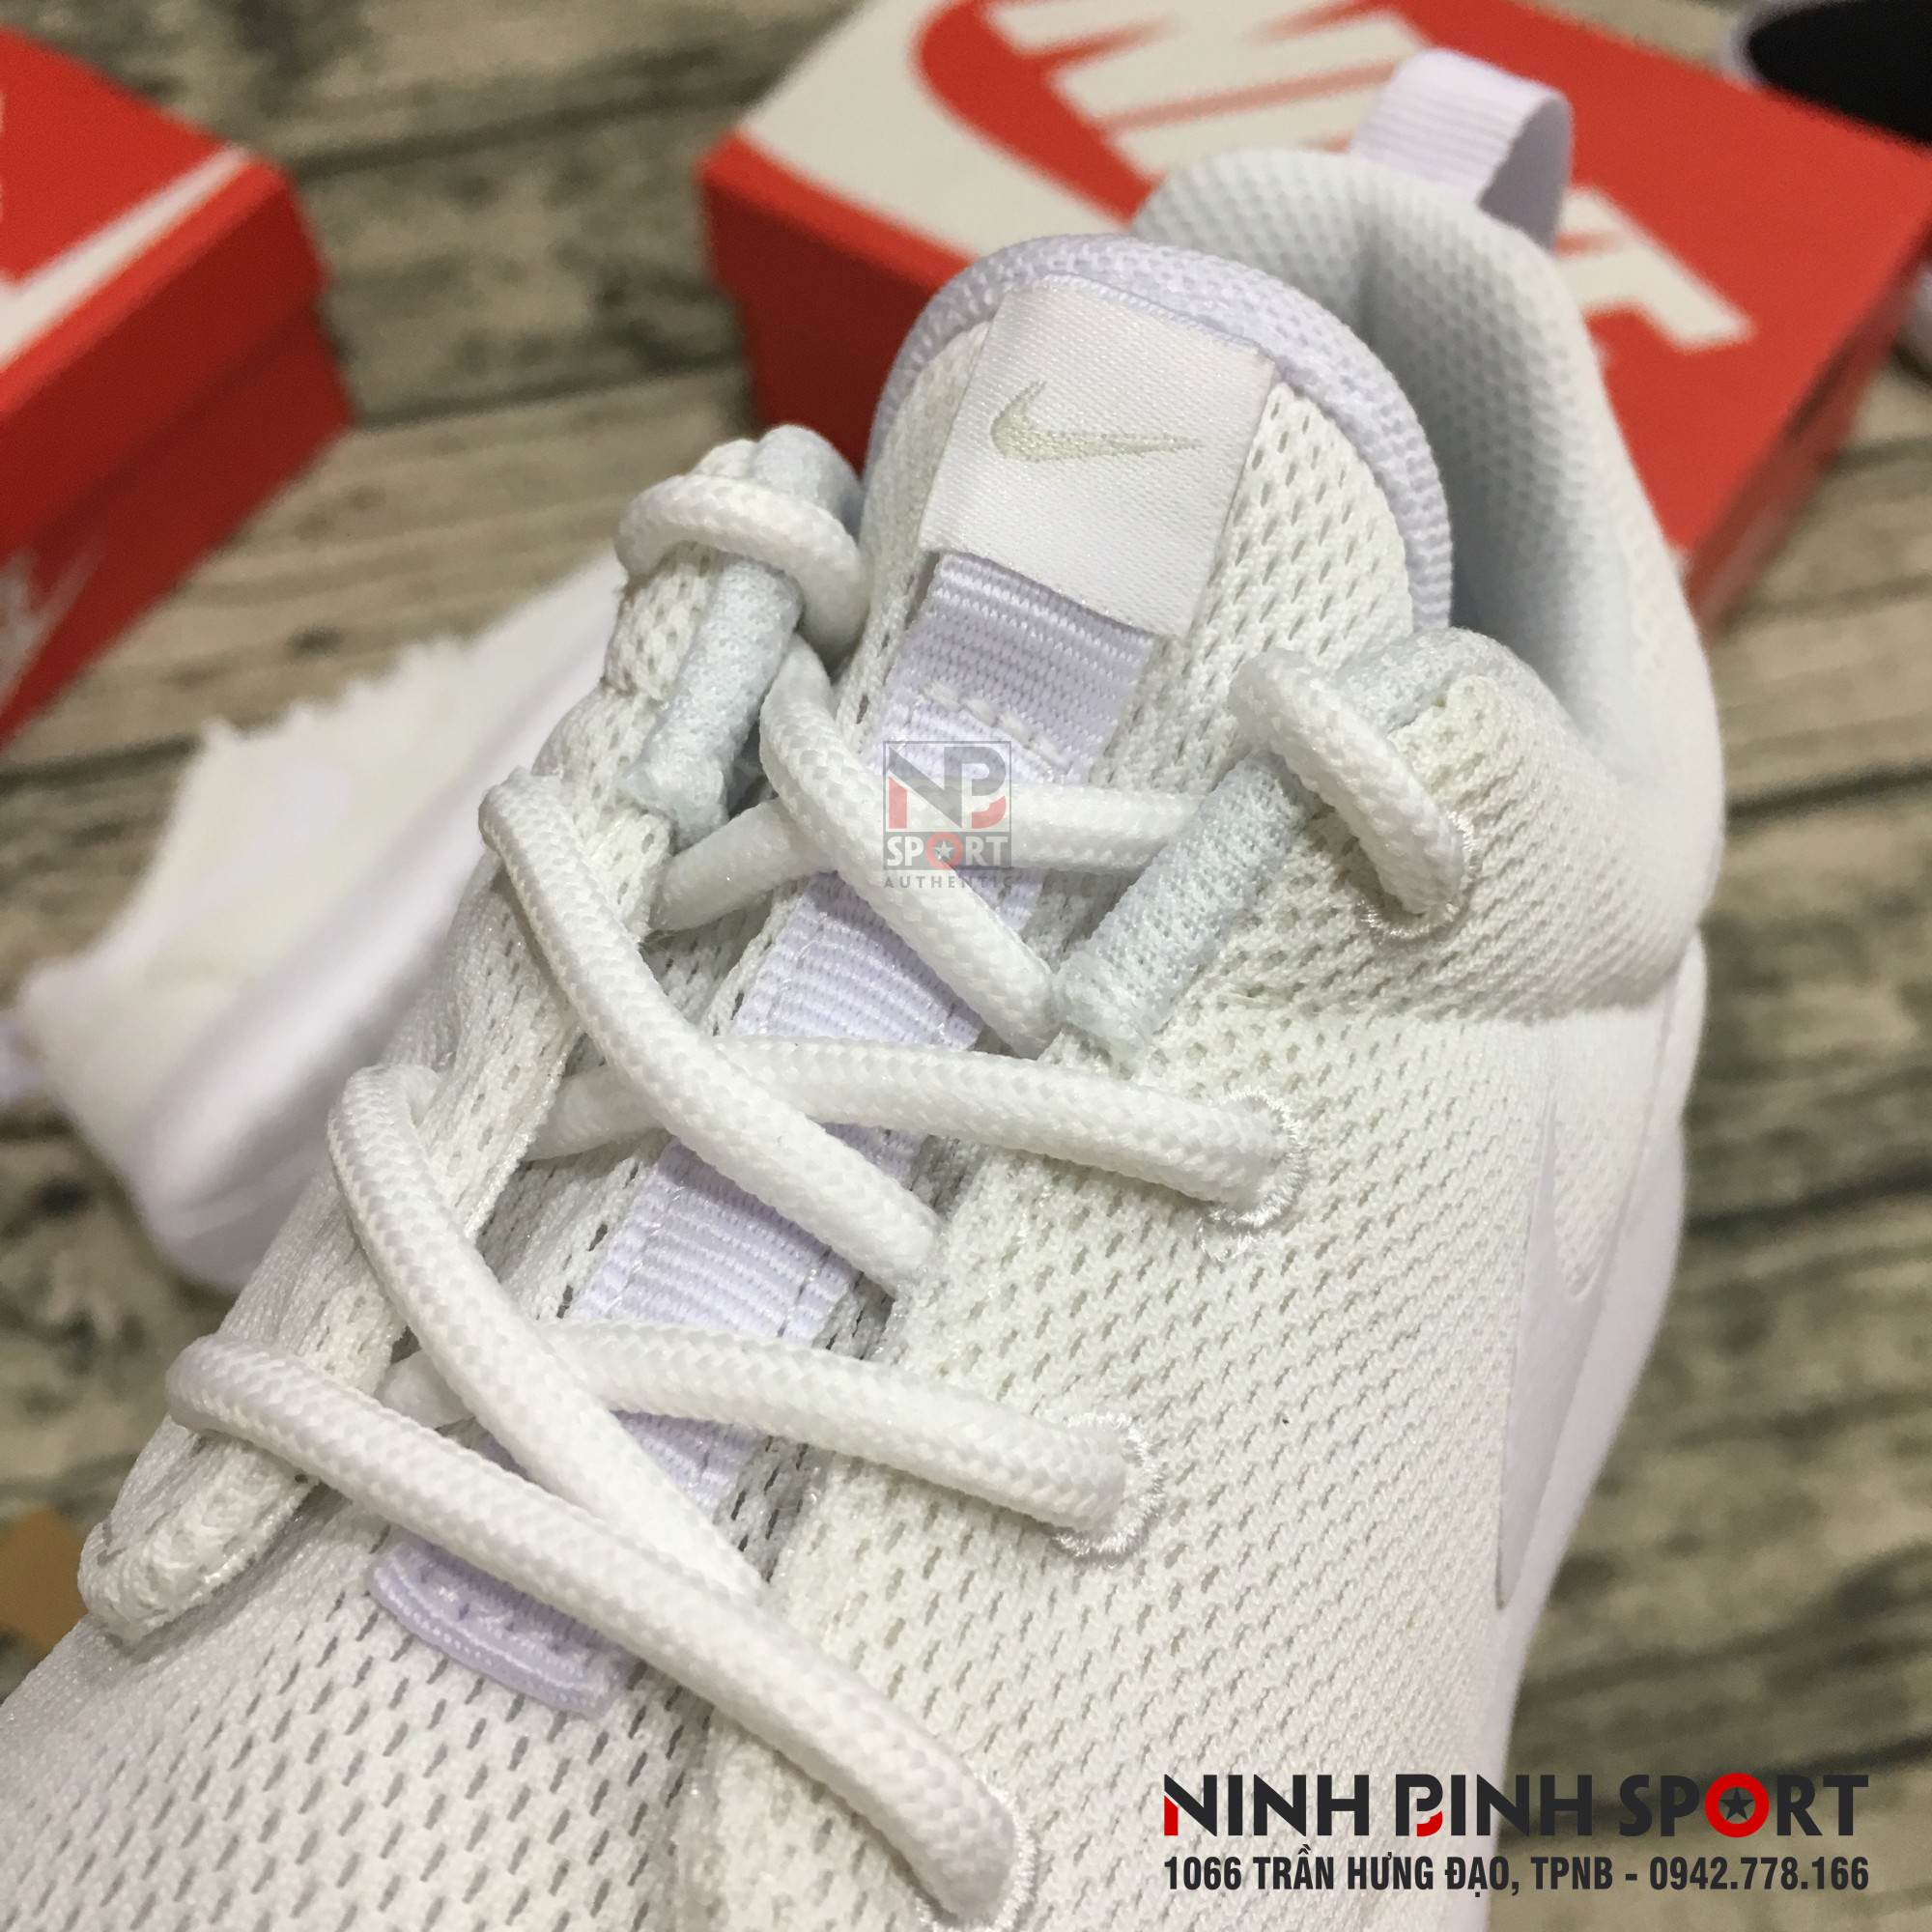 Giầy thể thao nữ Nike Roshe Run 844994-100